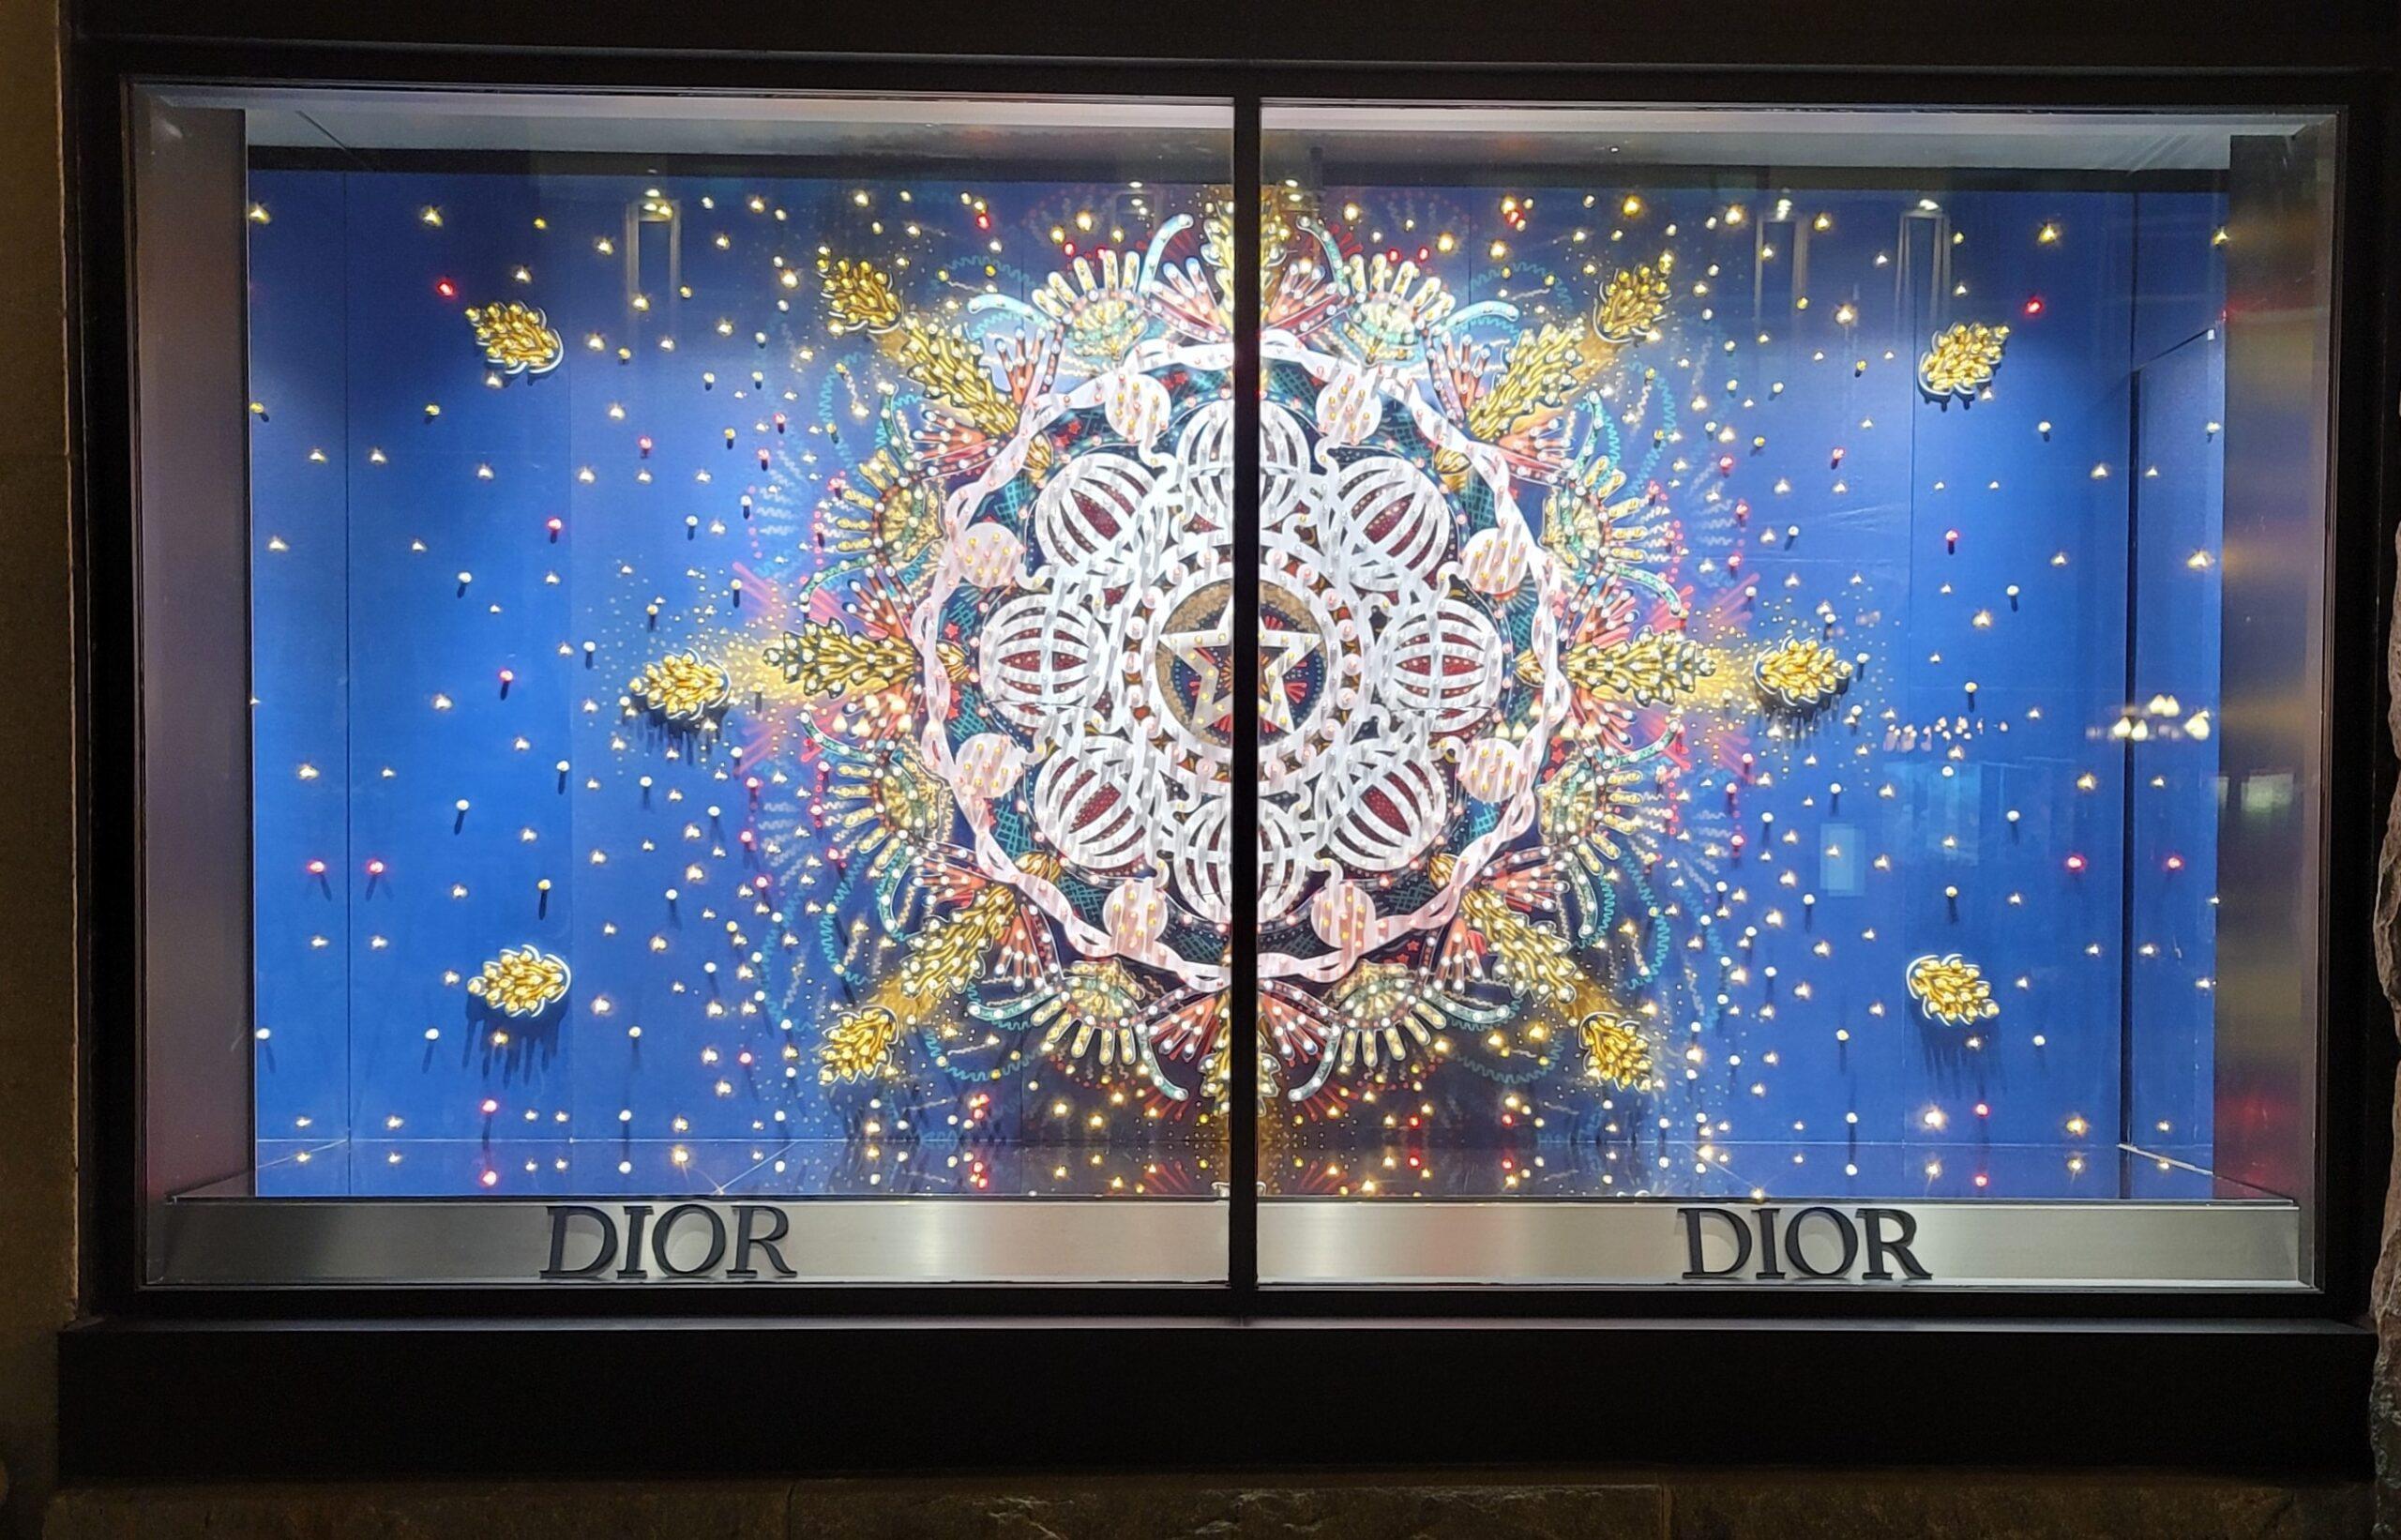 Christian Dior Holiday Display Exterior – Holt Renfrew – Ogilvy Montreal